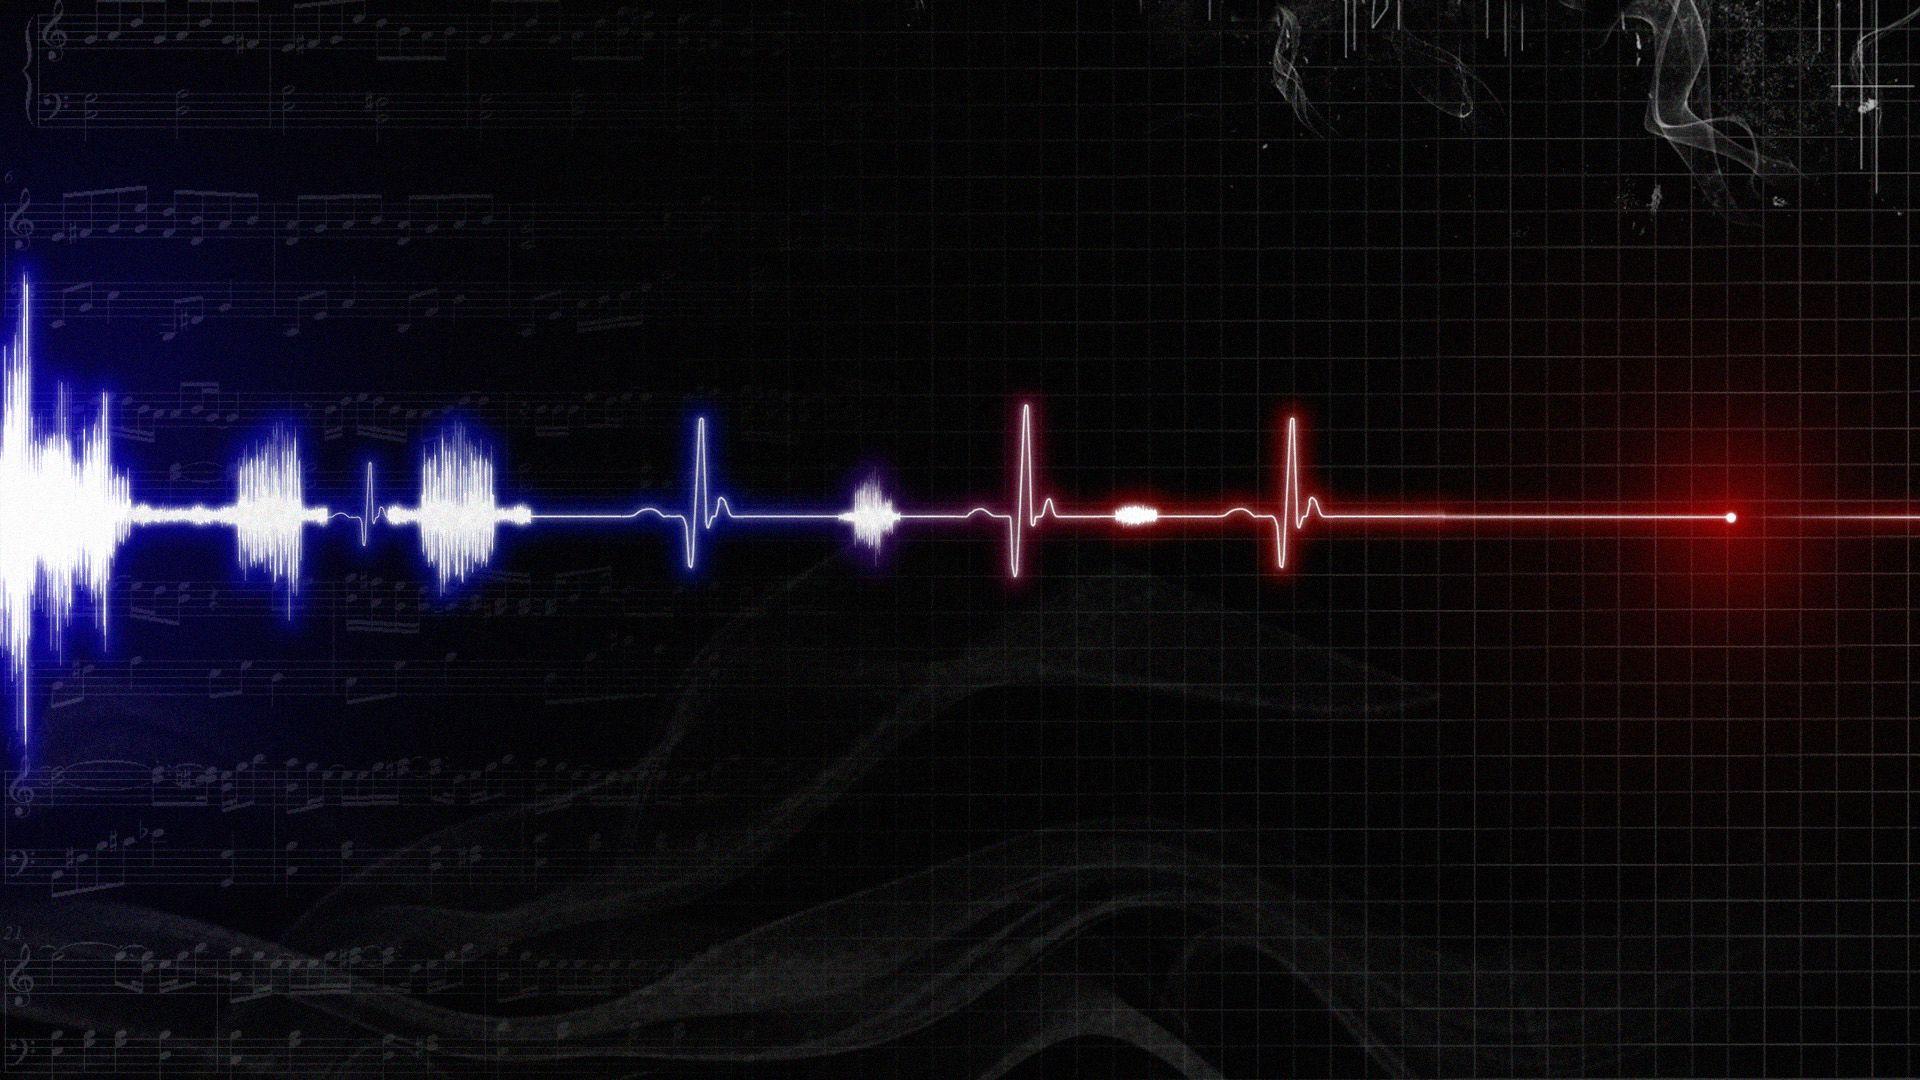 Most Inspiring Wallpaper Music Soundwave - 6b72b33d4ec023211dcc9b7ba2364fe4  Pictures_597691.jpg